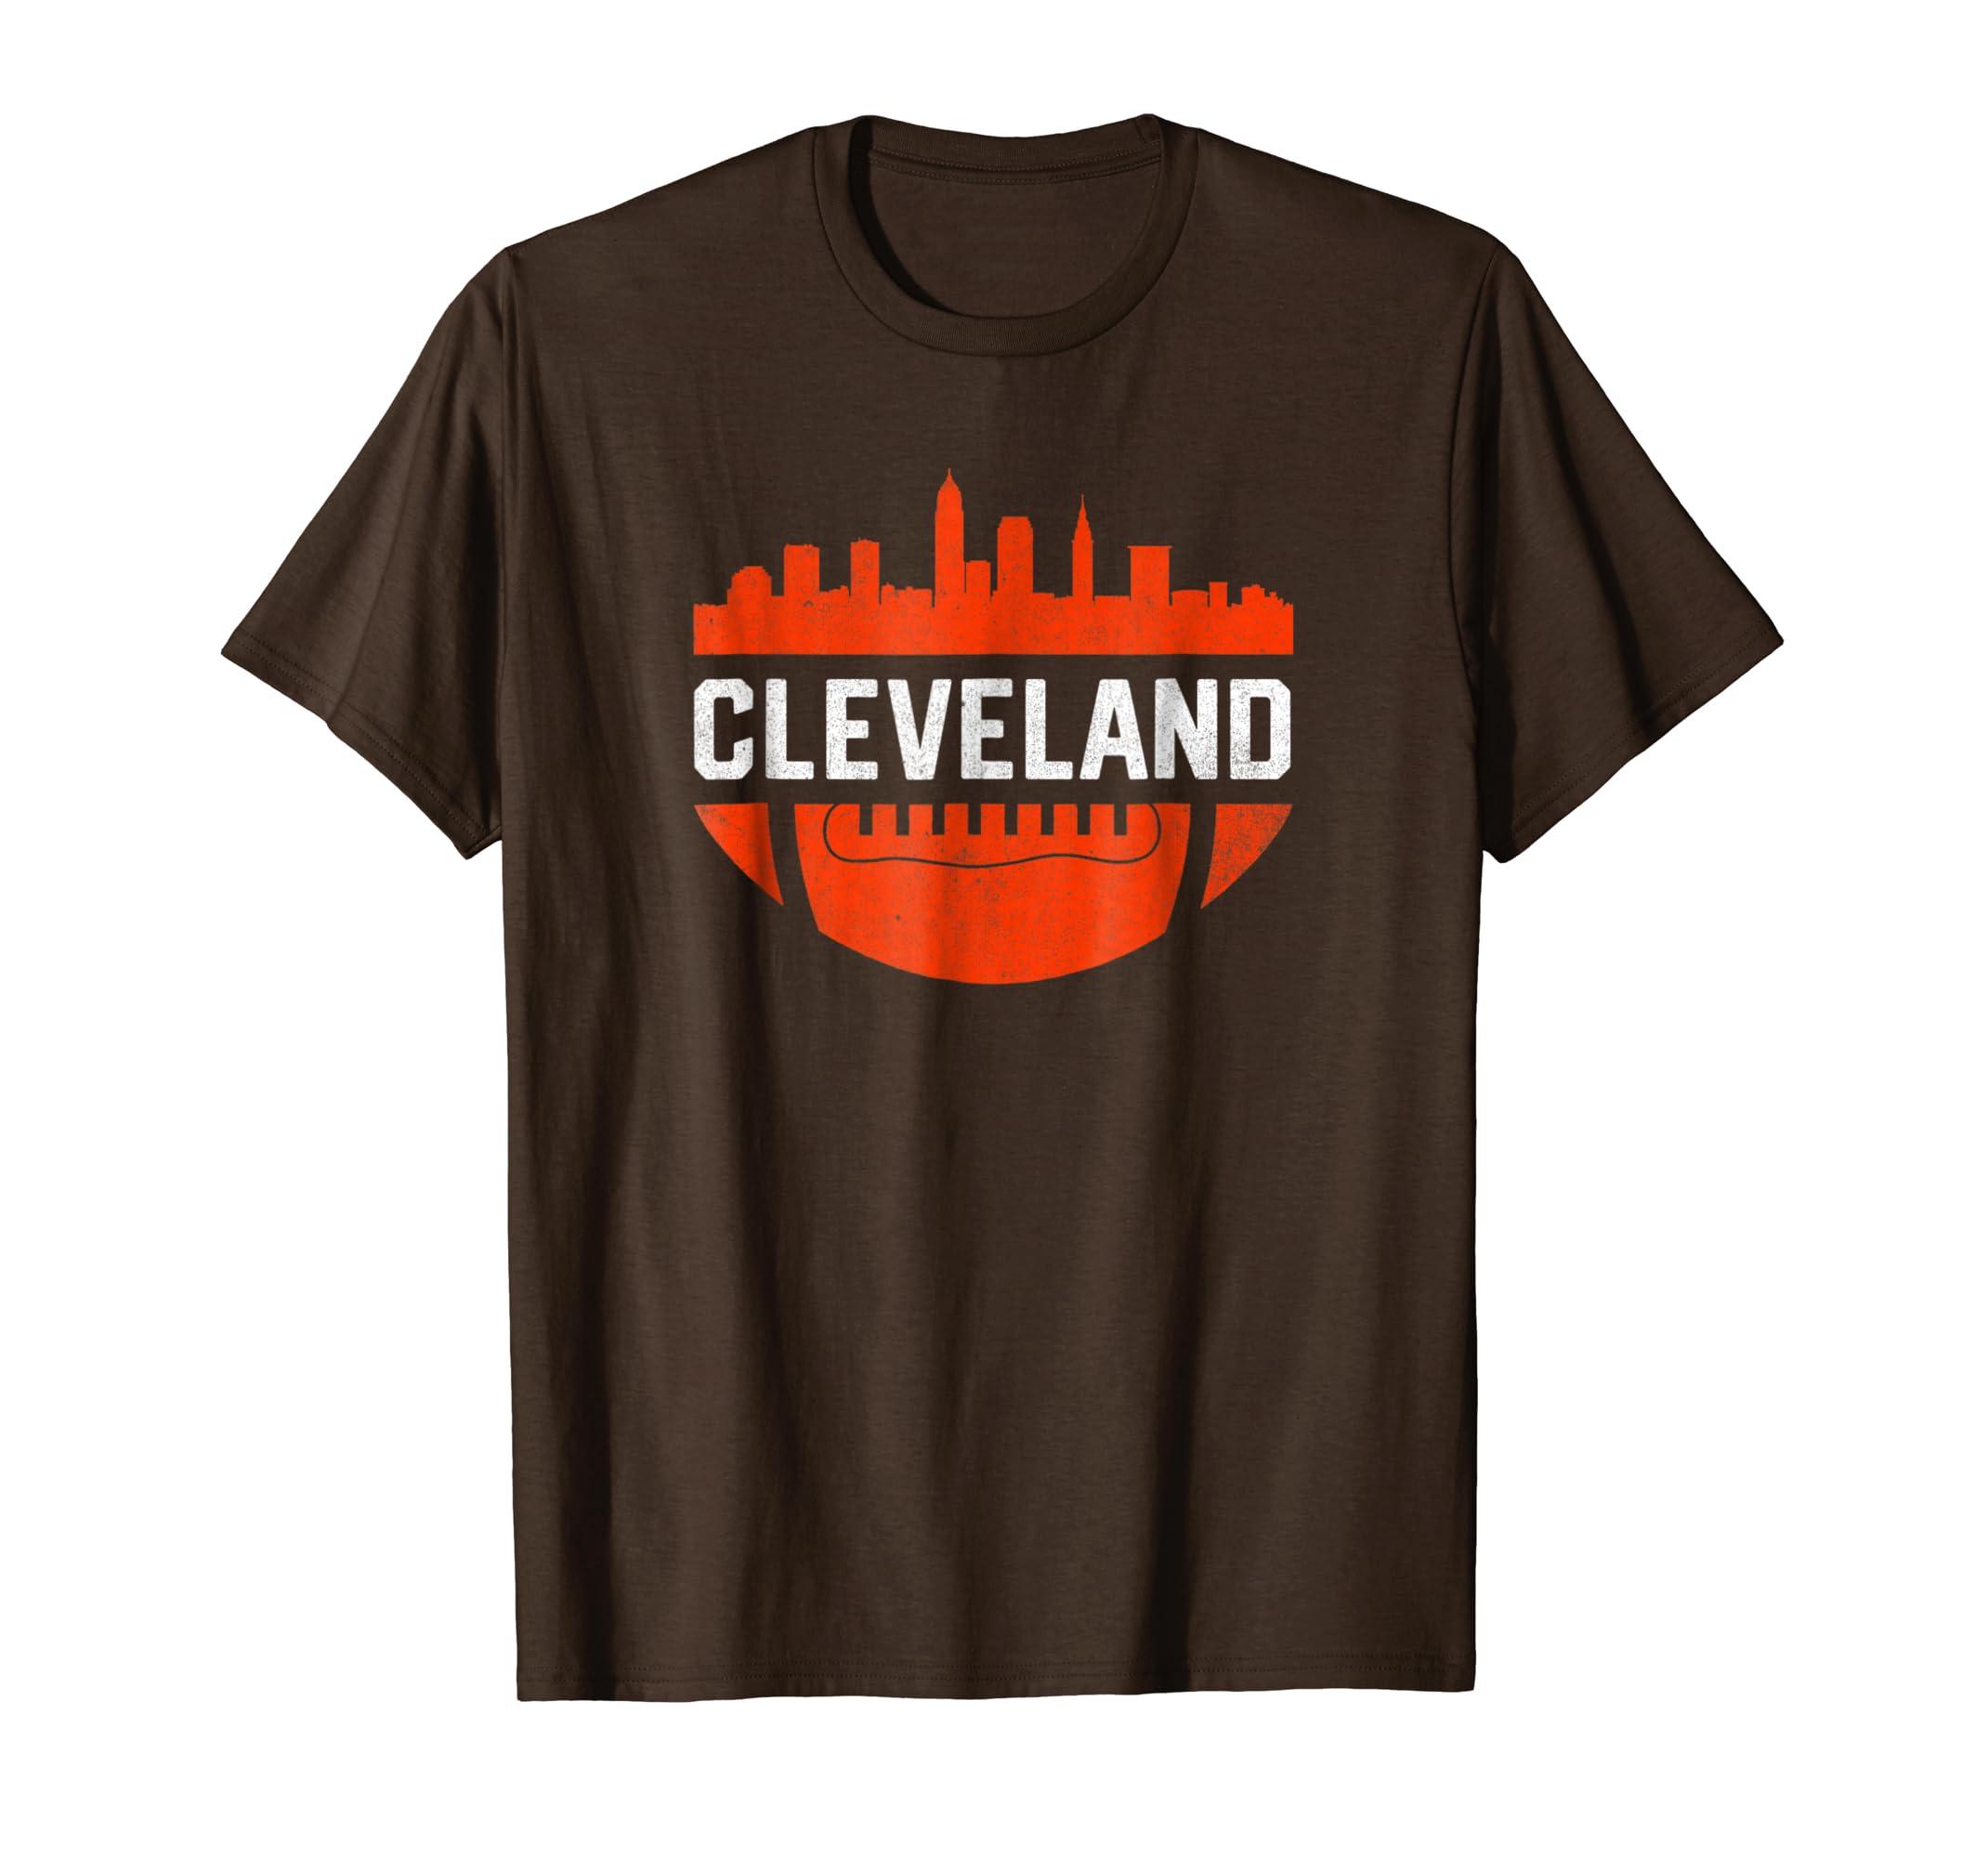 775245a44184 Amazon.com: Vintage Downtown Cleveland Ohio Skyline Football T-Shirt:  Clothing